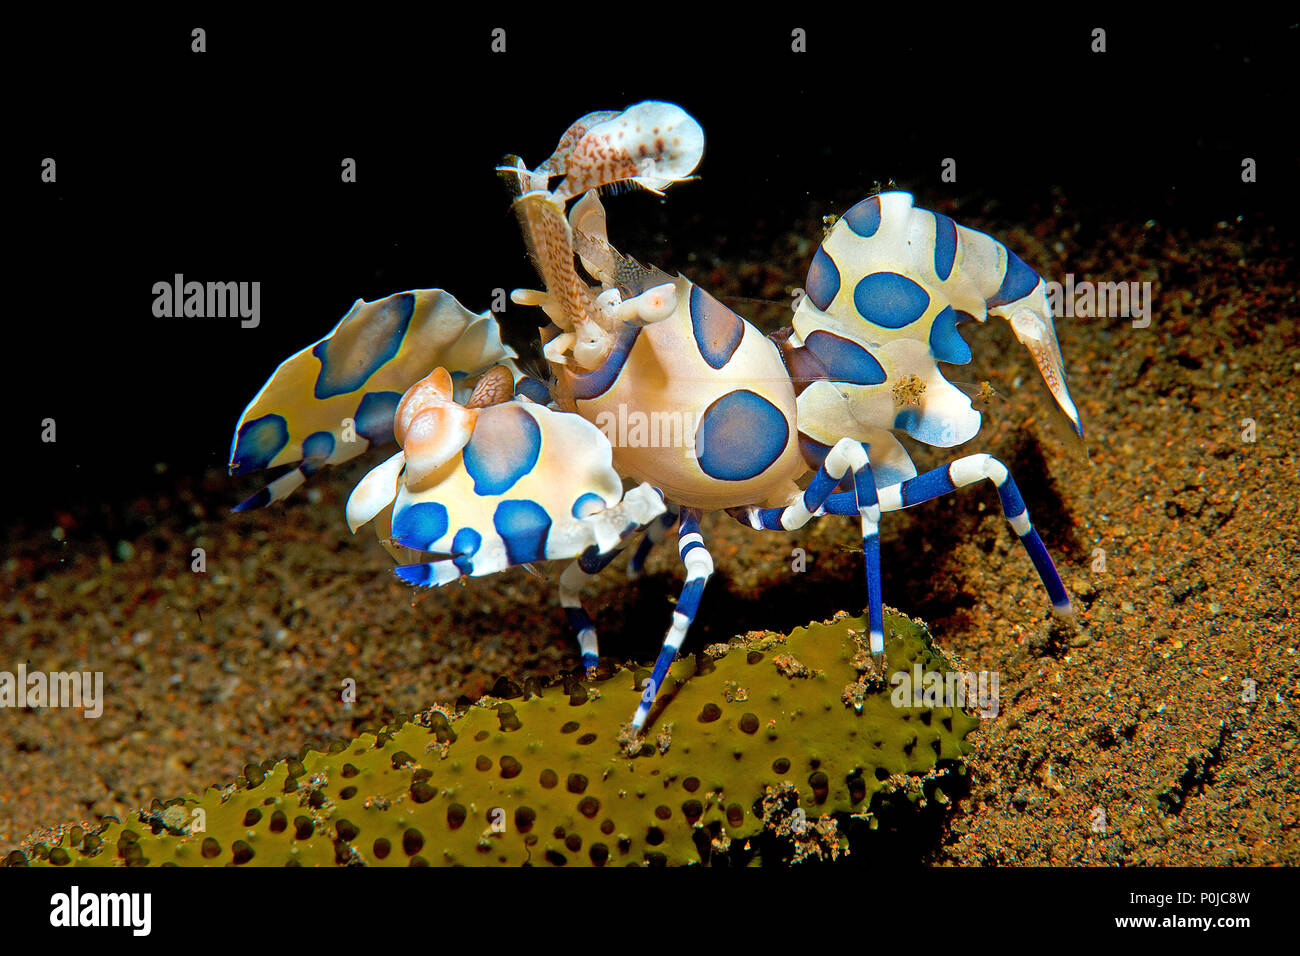 Harlekingarnele (Hymenocera elegans), Bali, Indonesien | Harlequin shrimp (Hymenocera elegans), Bali, Indonesia - Stock Image